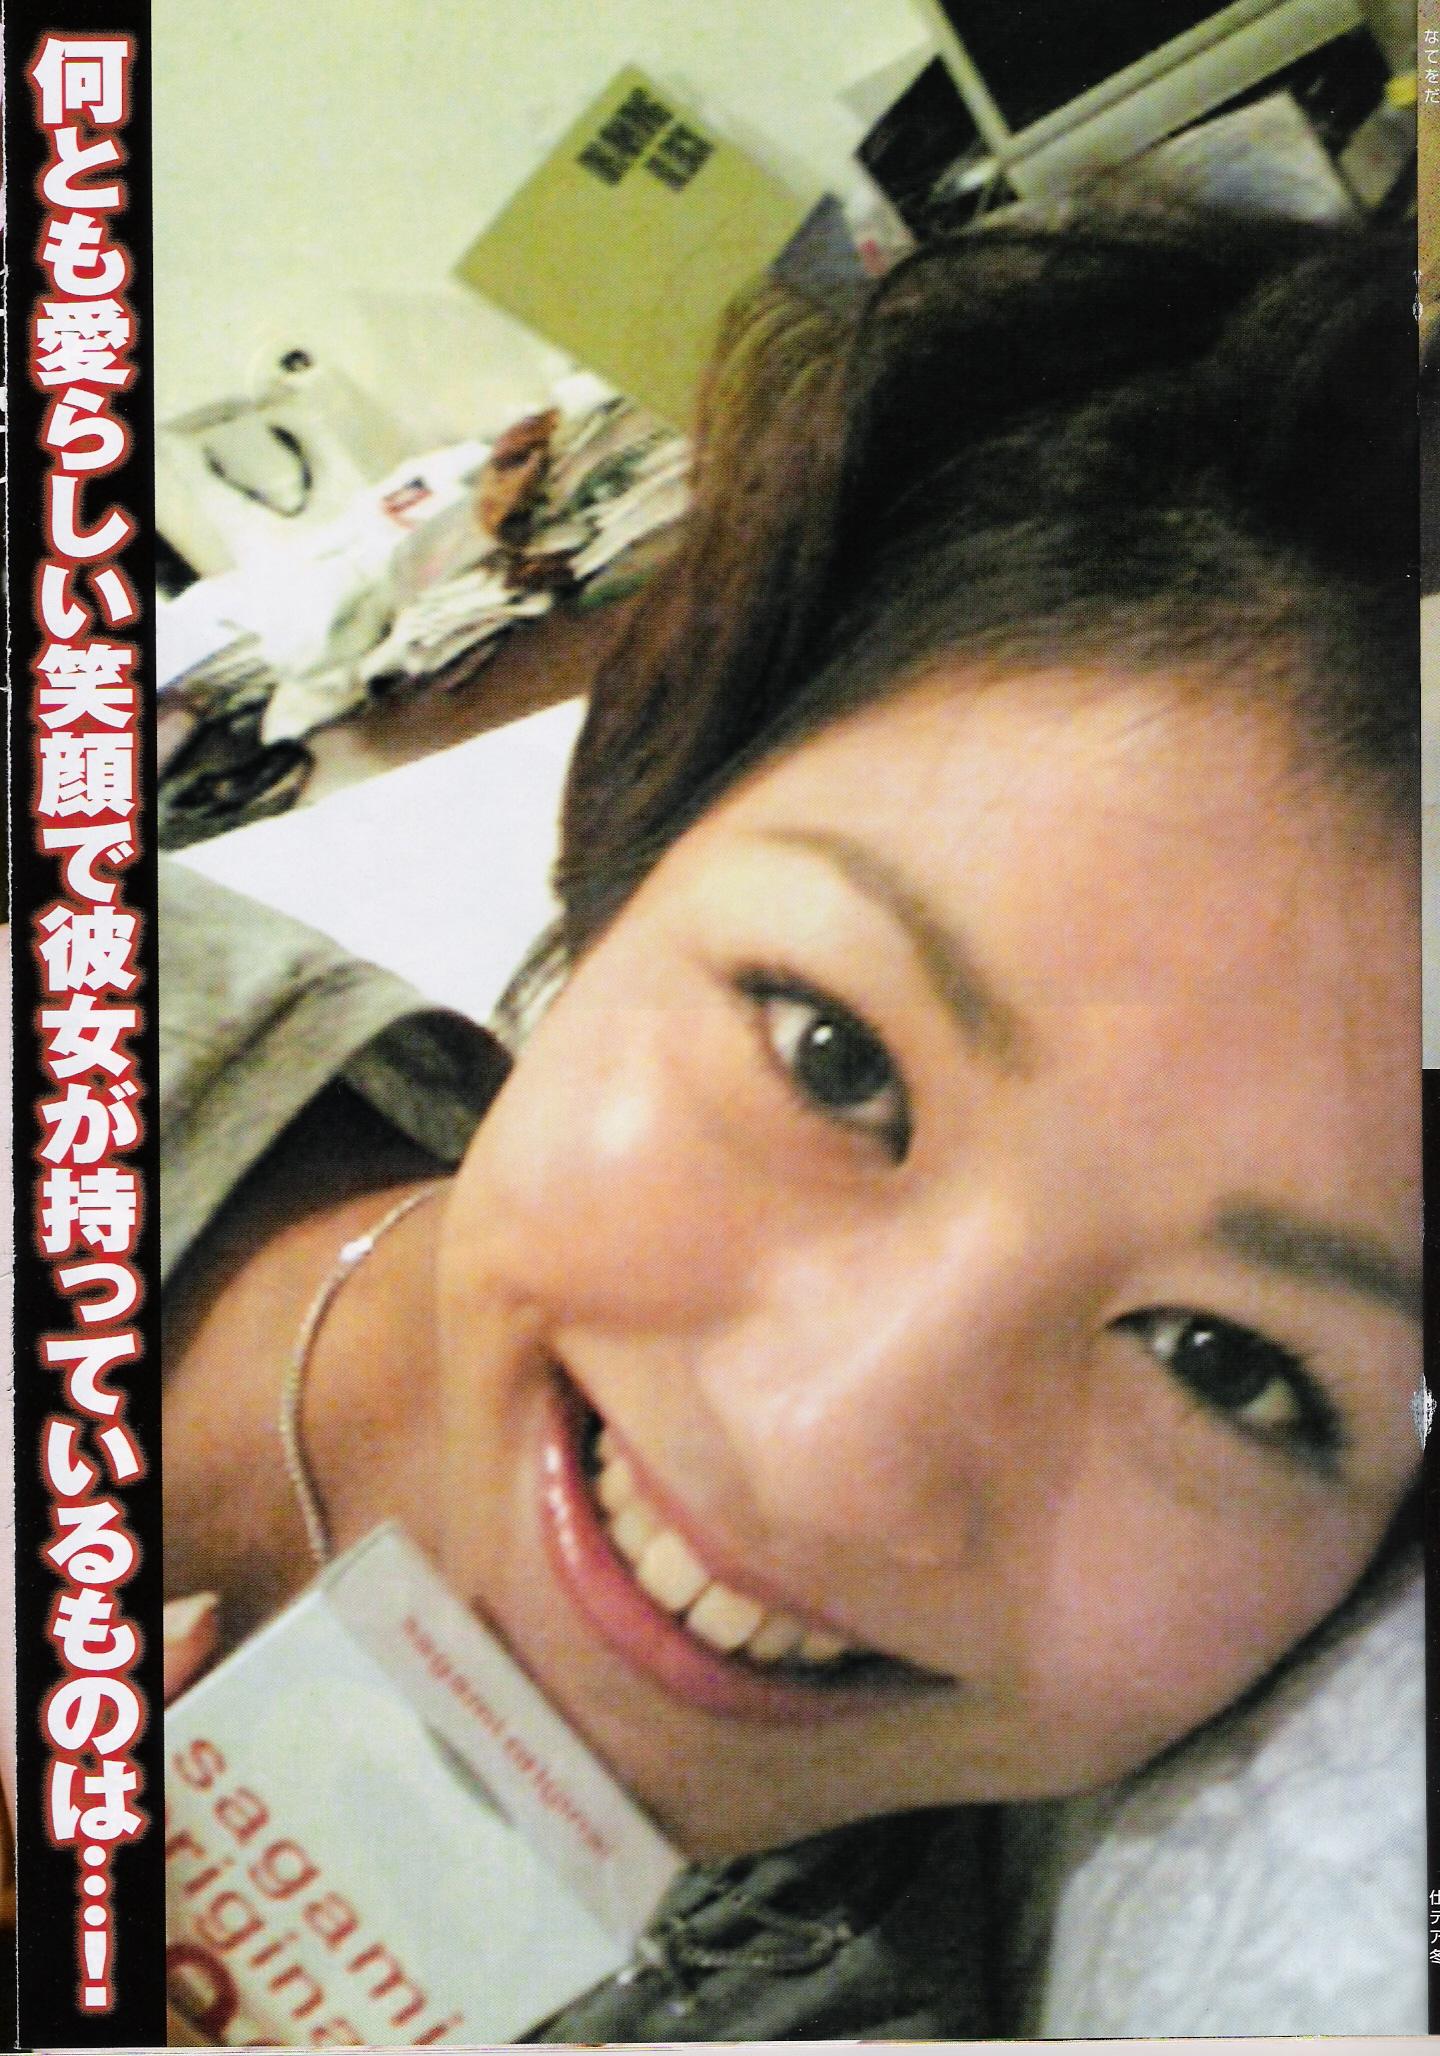 http://livedoor.blogimg.jp/tvmania/imgs/b/1/b14dde10.jpg